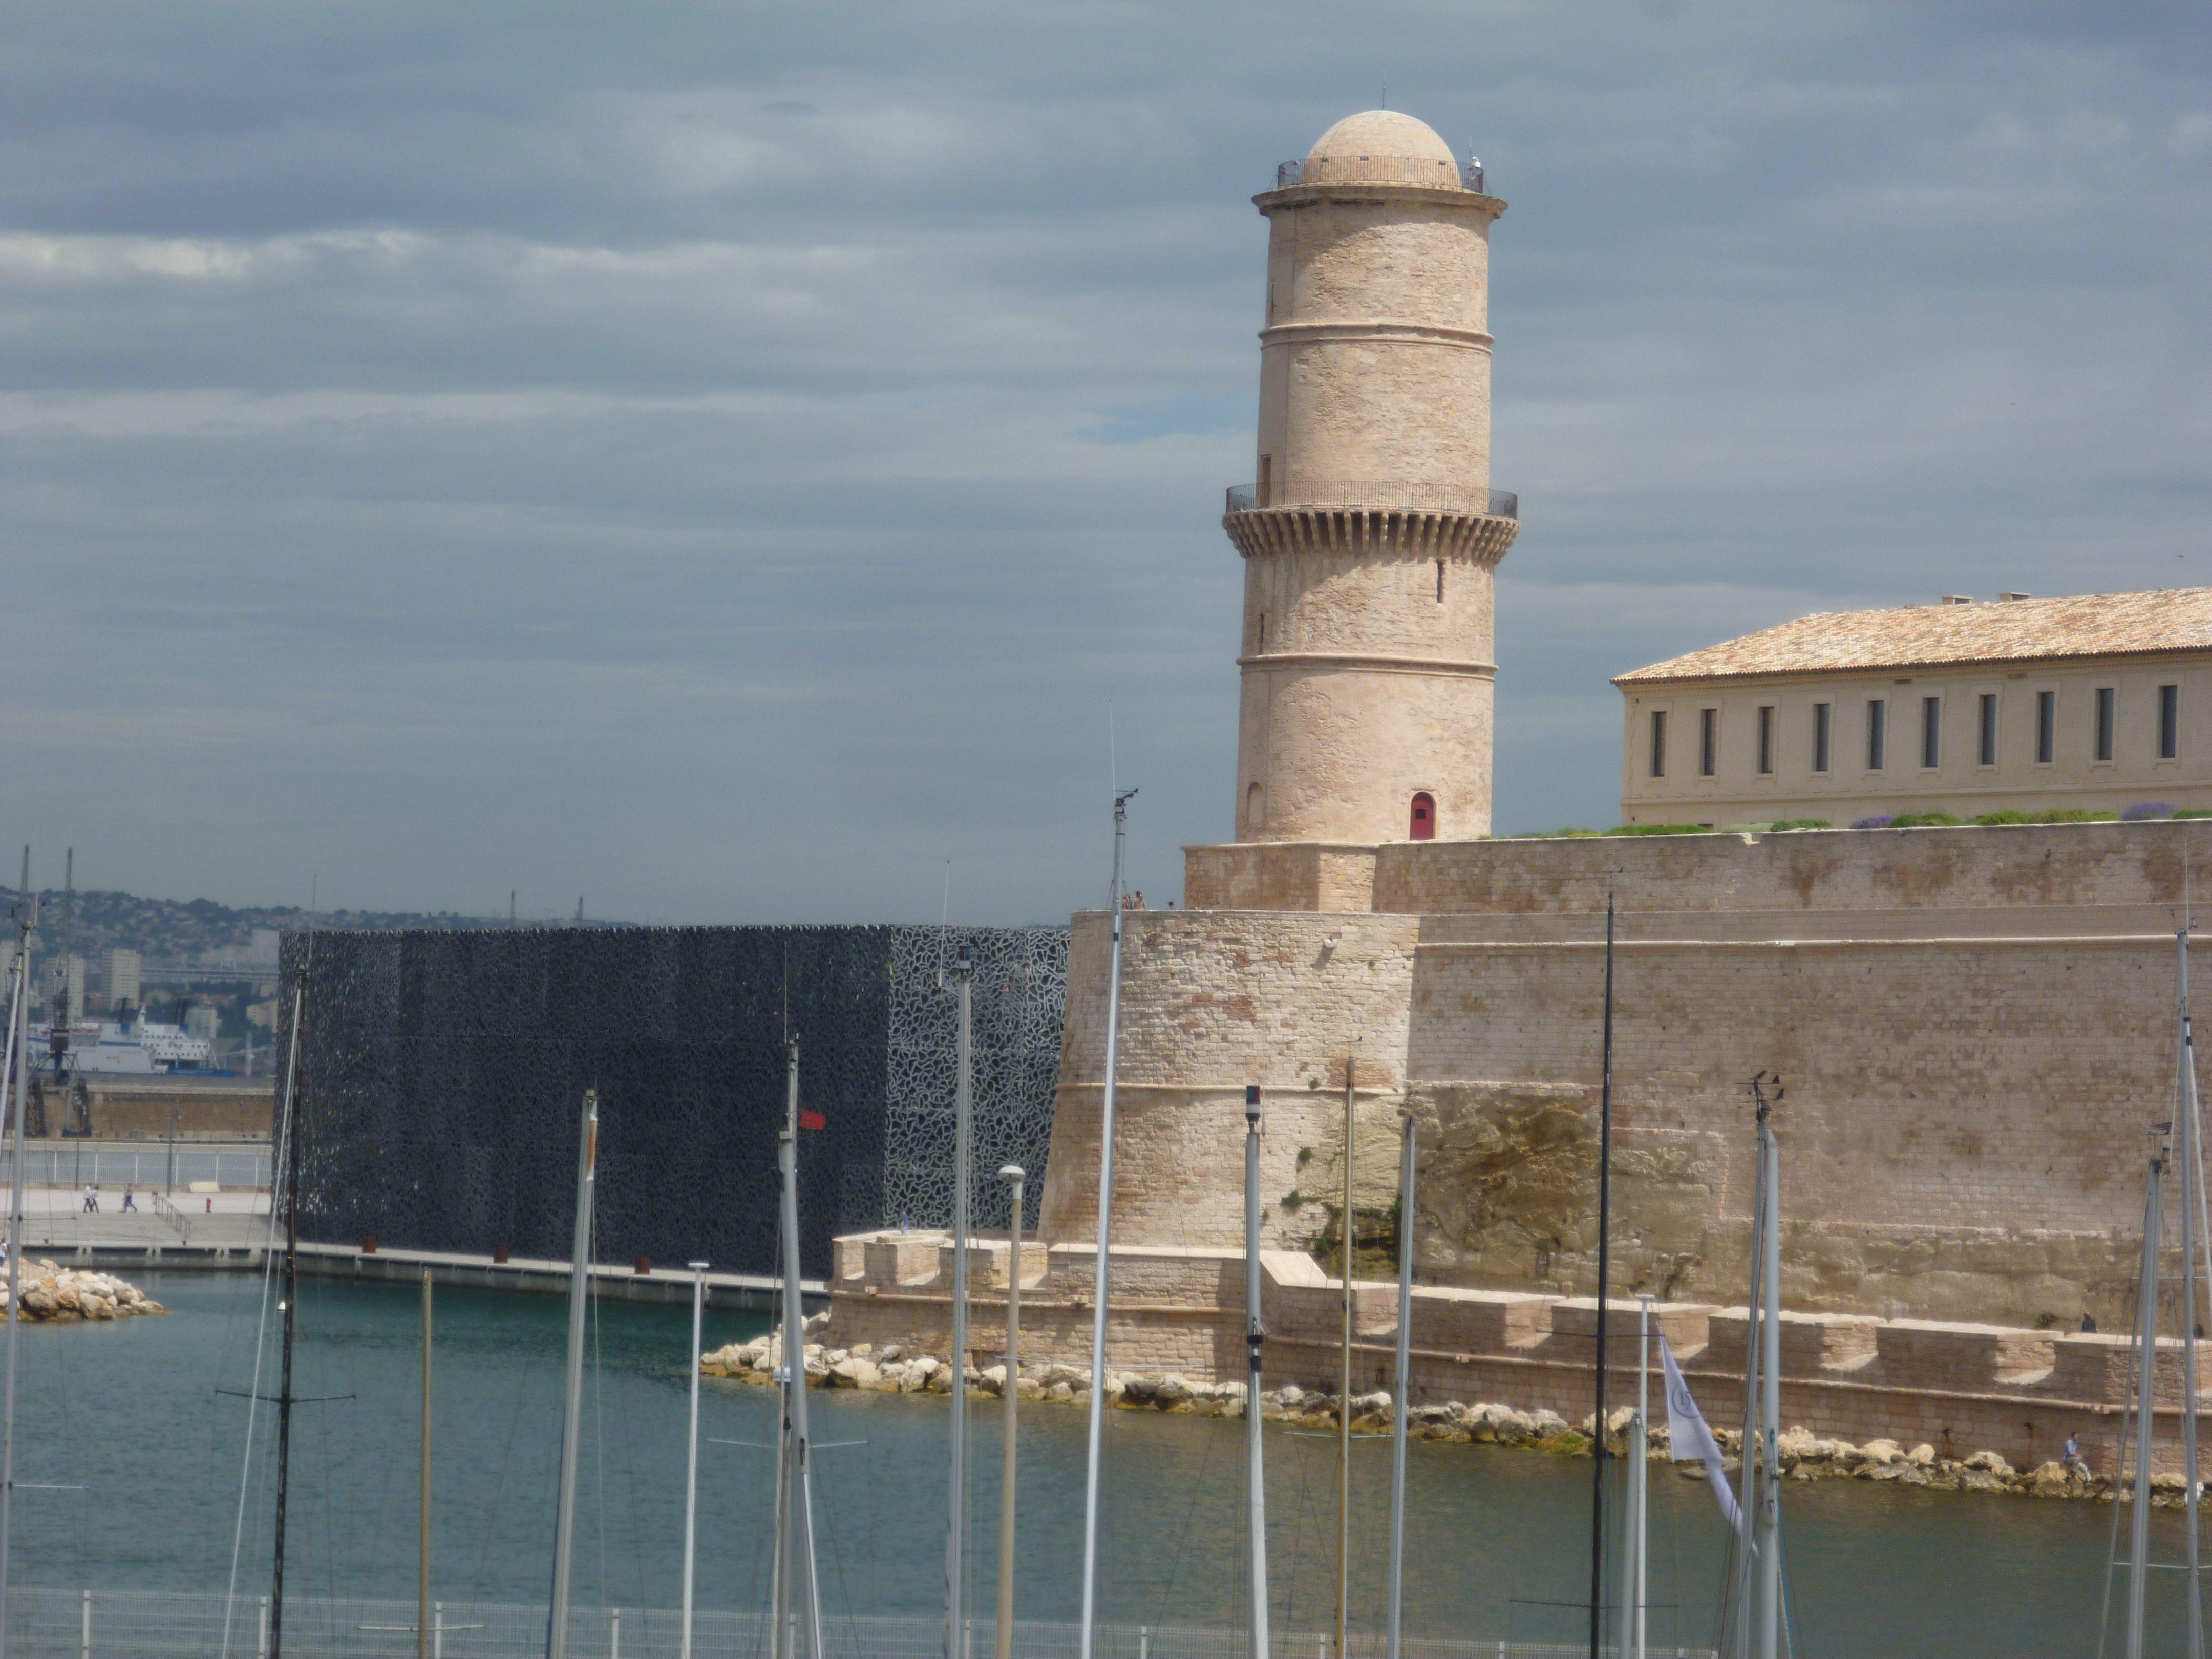 MuCem and Fort Saint-Jean